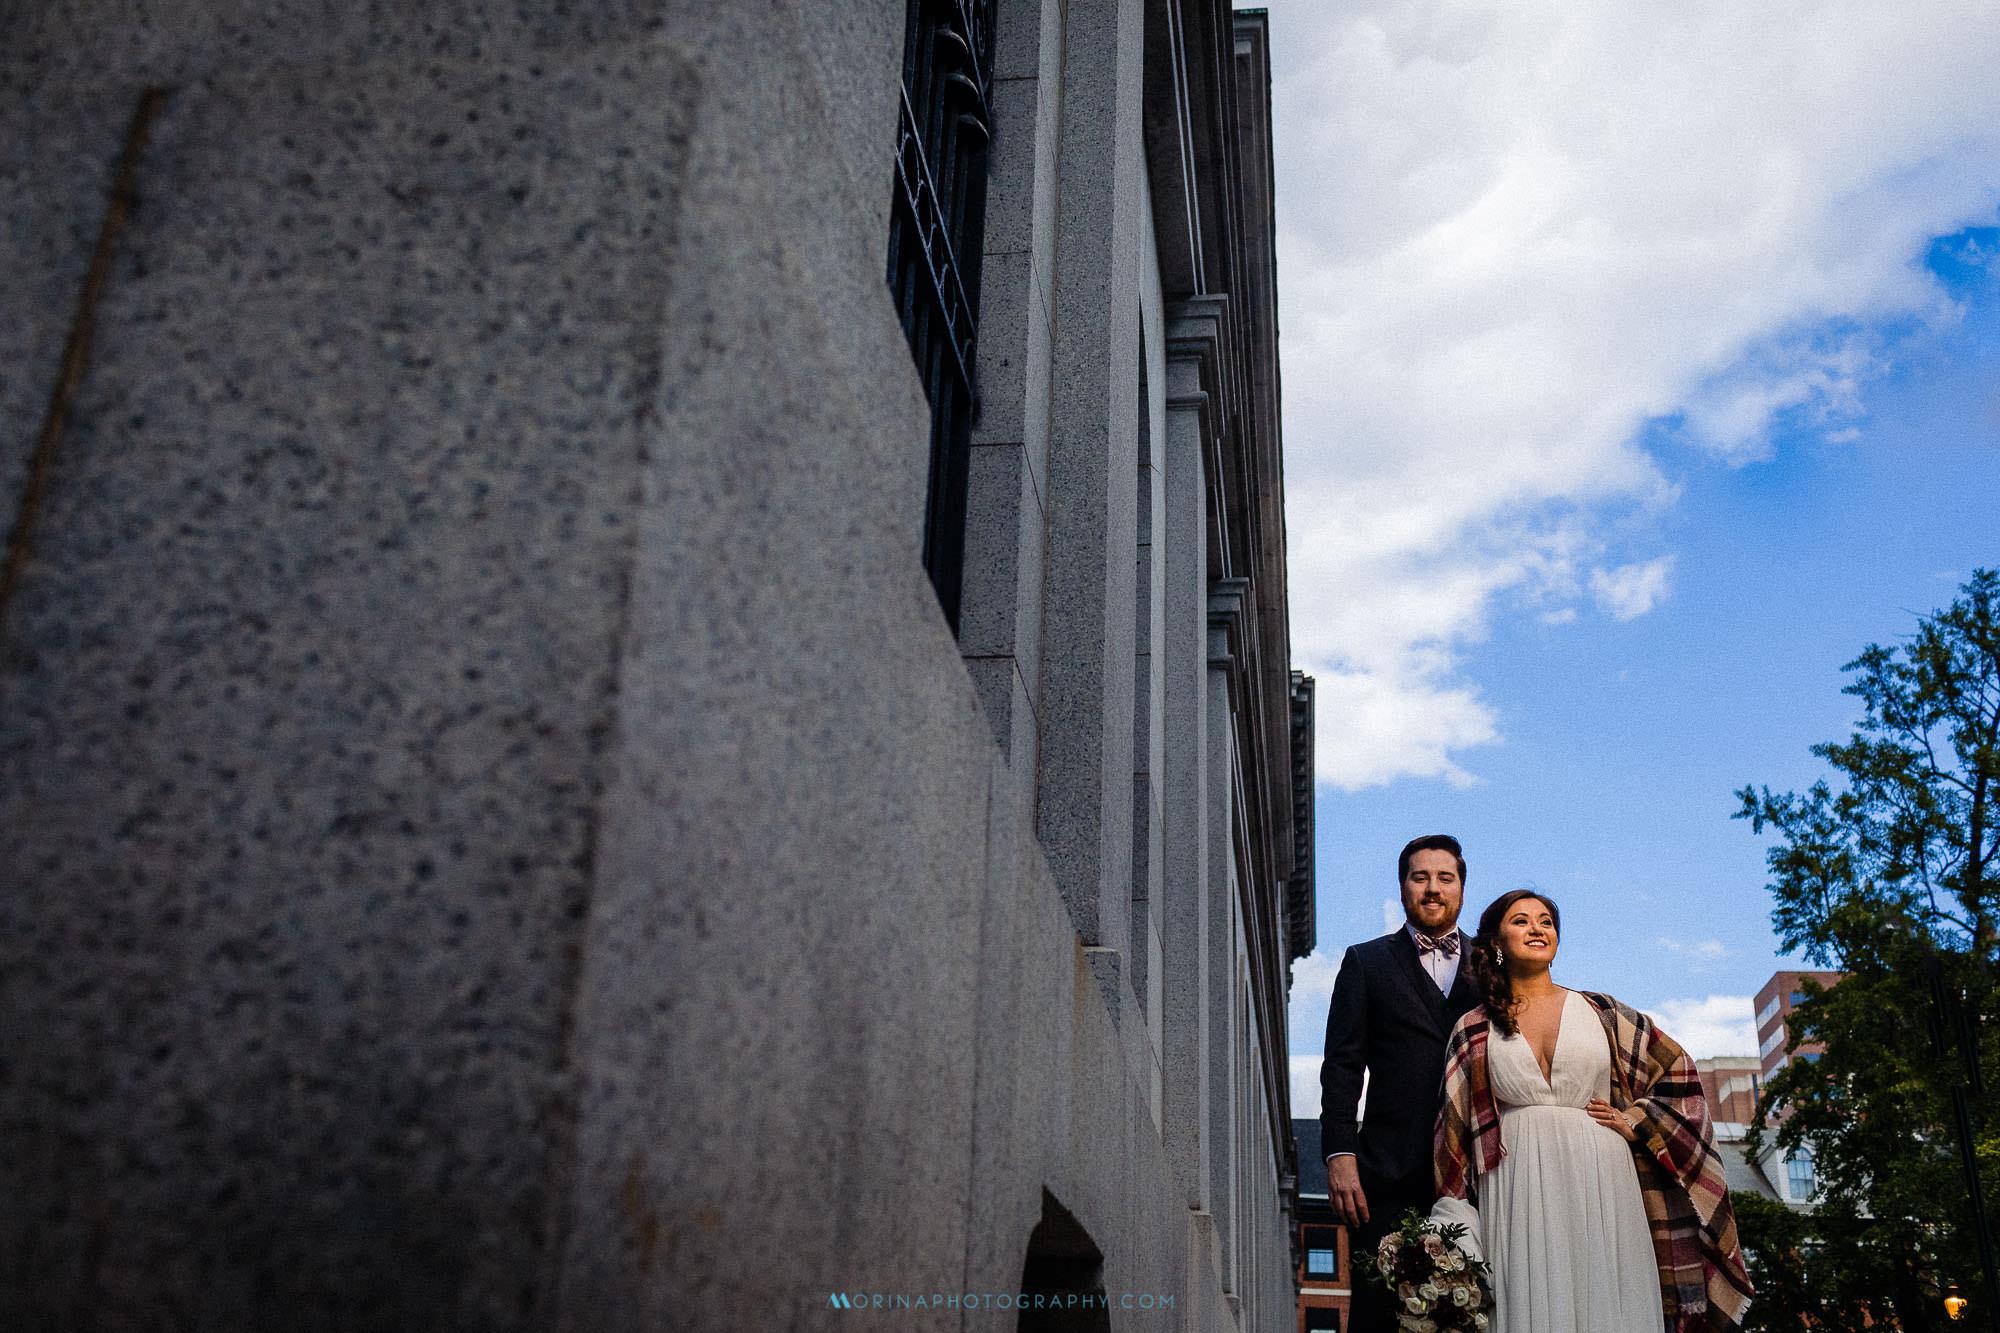 Yuki & Michael Wedding at Morris House Hotel Blog 0051.jpg